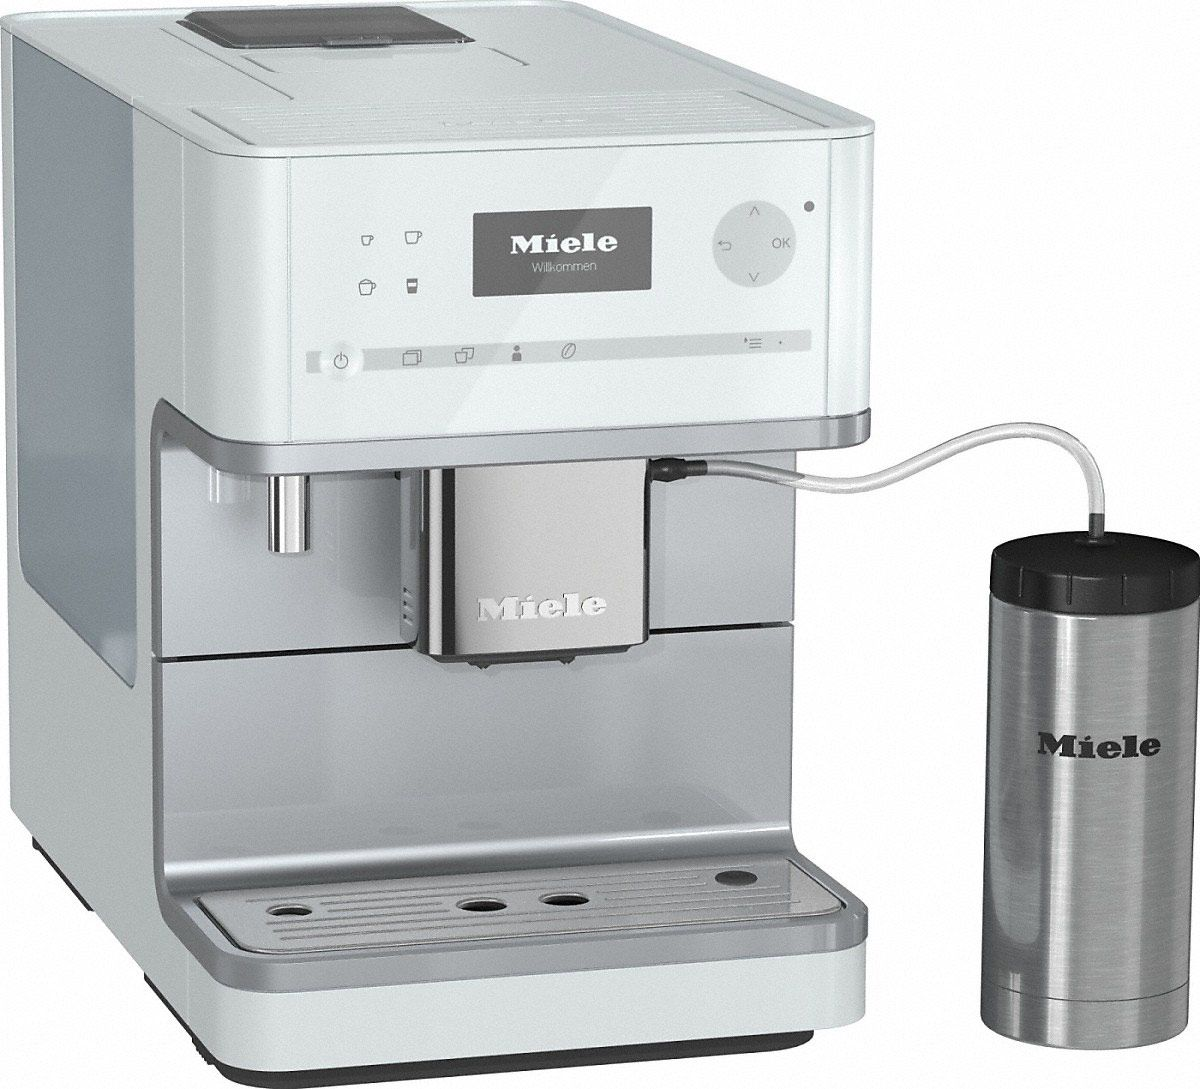 freestanding plumbing sensor miele blanchford cup shop cupsensor plumbed maker coffee machines